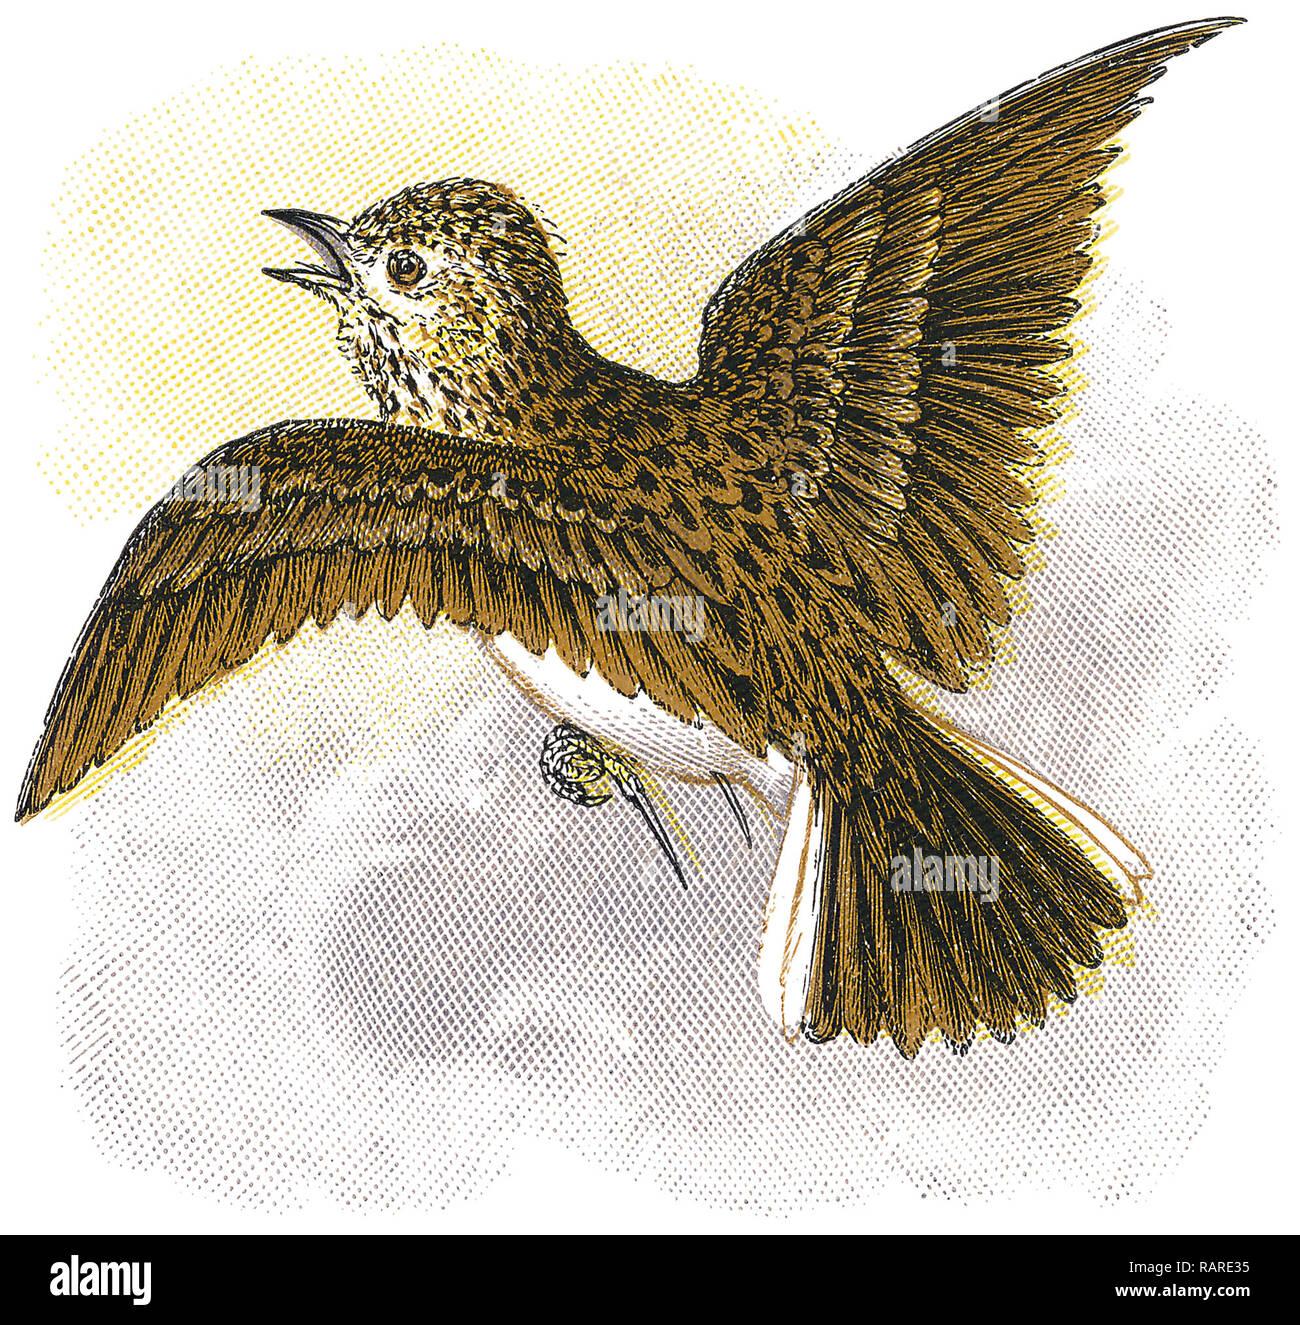 1898 colour engraving of a Eurasian skylark (Alauda arvensis). - Stock Image